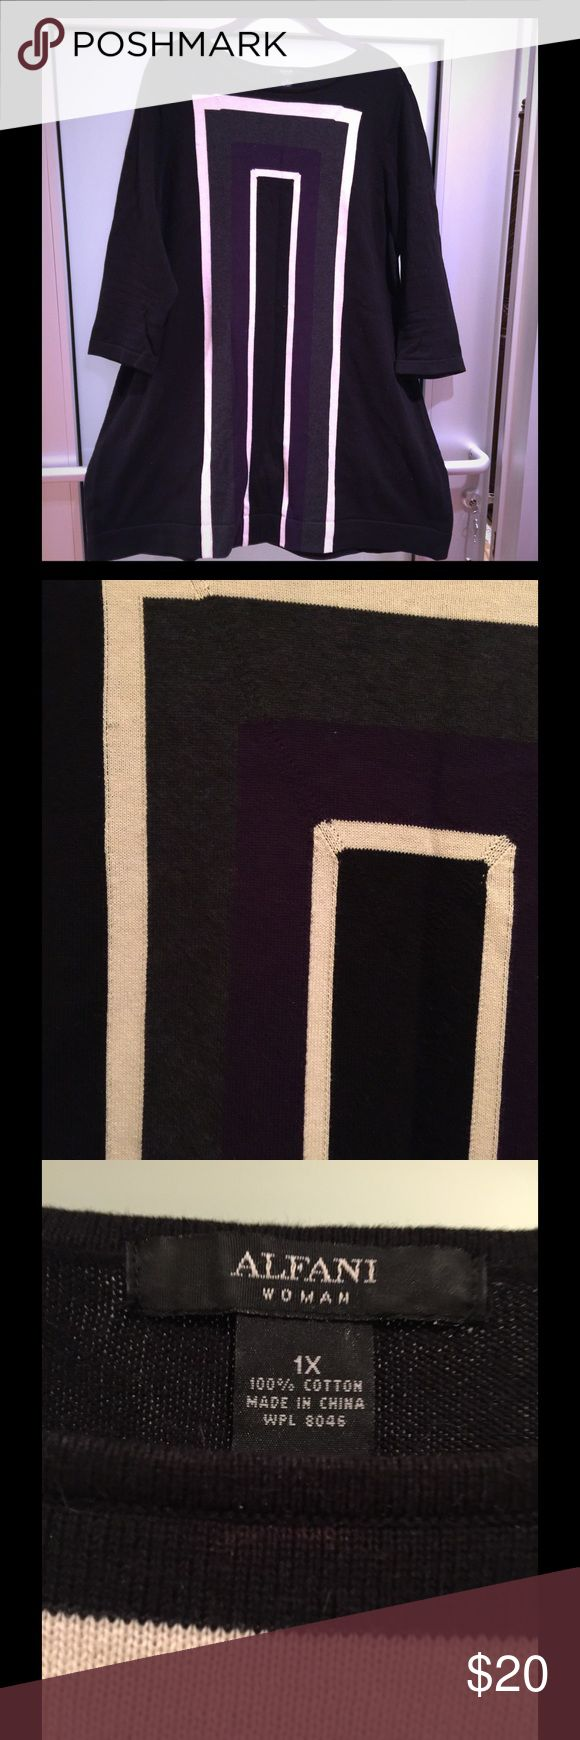 Black Cotton Knit Tunic with Geometric Design Black Cotton Knit Tunic with cream/grey/purple geometric design 100% Cotton Perfect with leggings and boots excellent condition Afani Tops Tunics